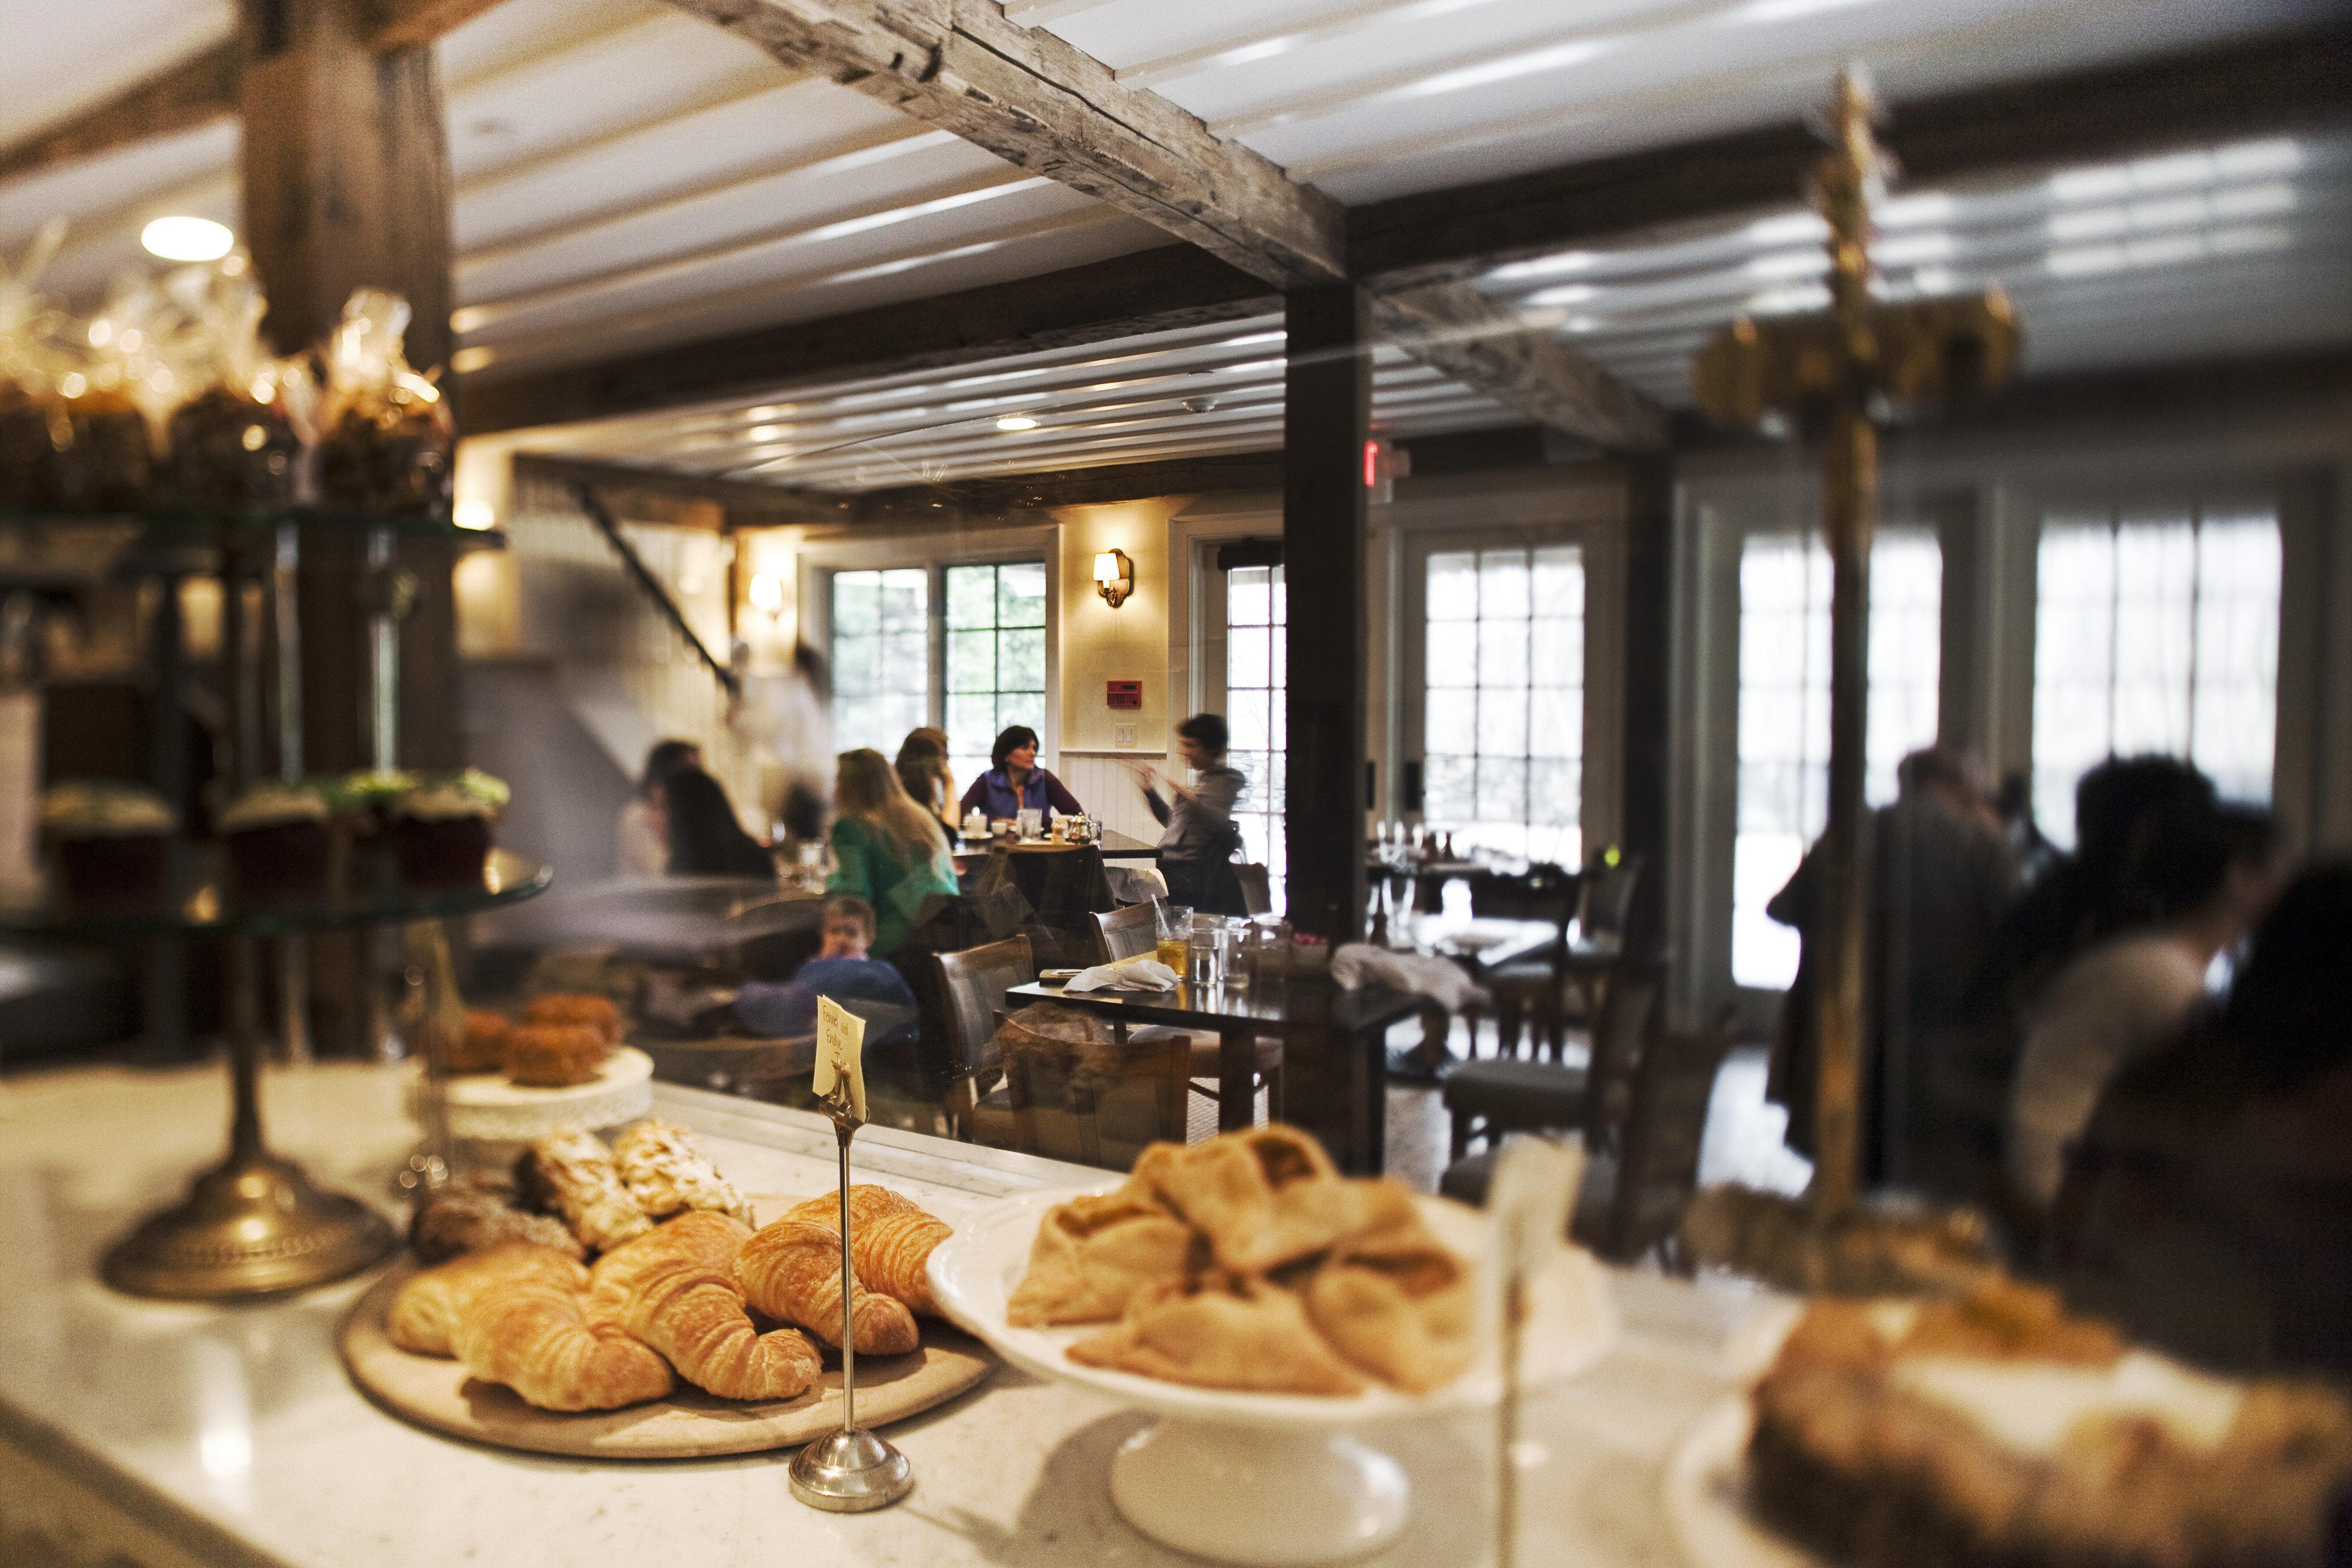 Country Dining Drink Eat Inn Luxury Modern restaurant brunch bakery sense breakfast food buffet dining table